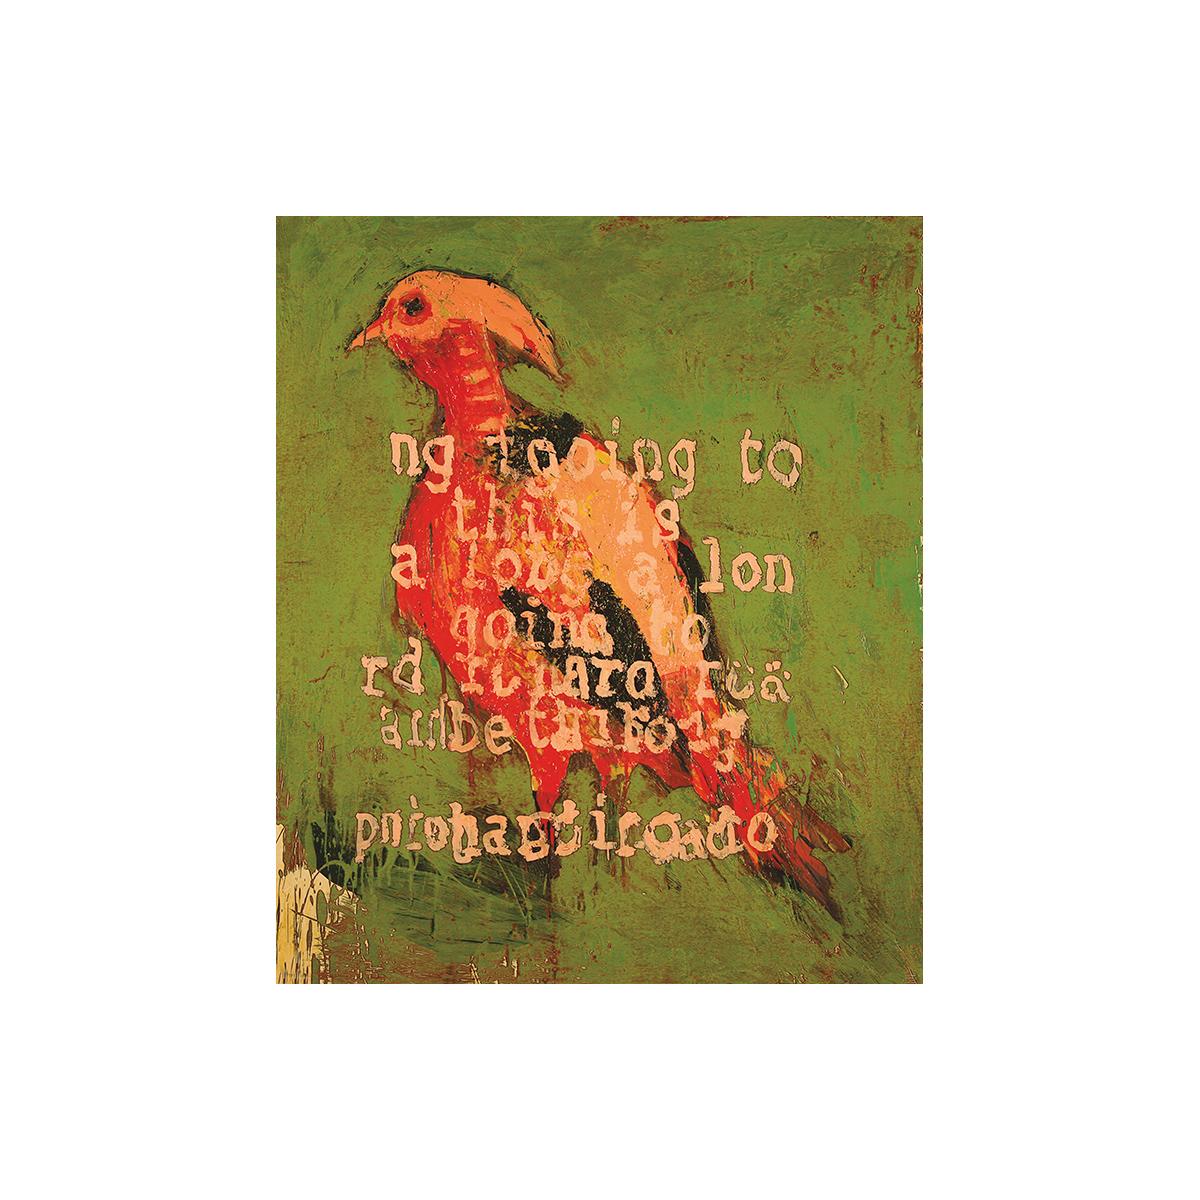 pheasantf.jpg